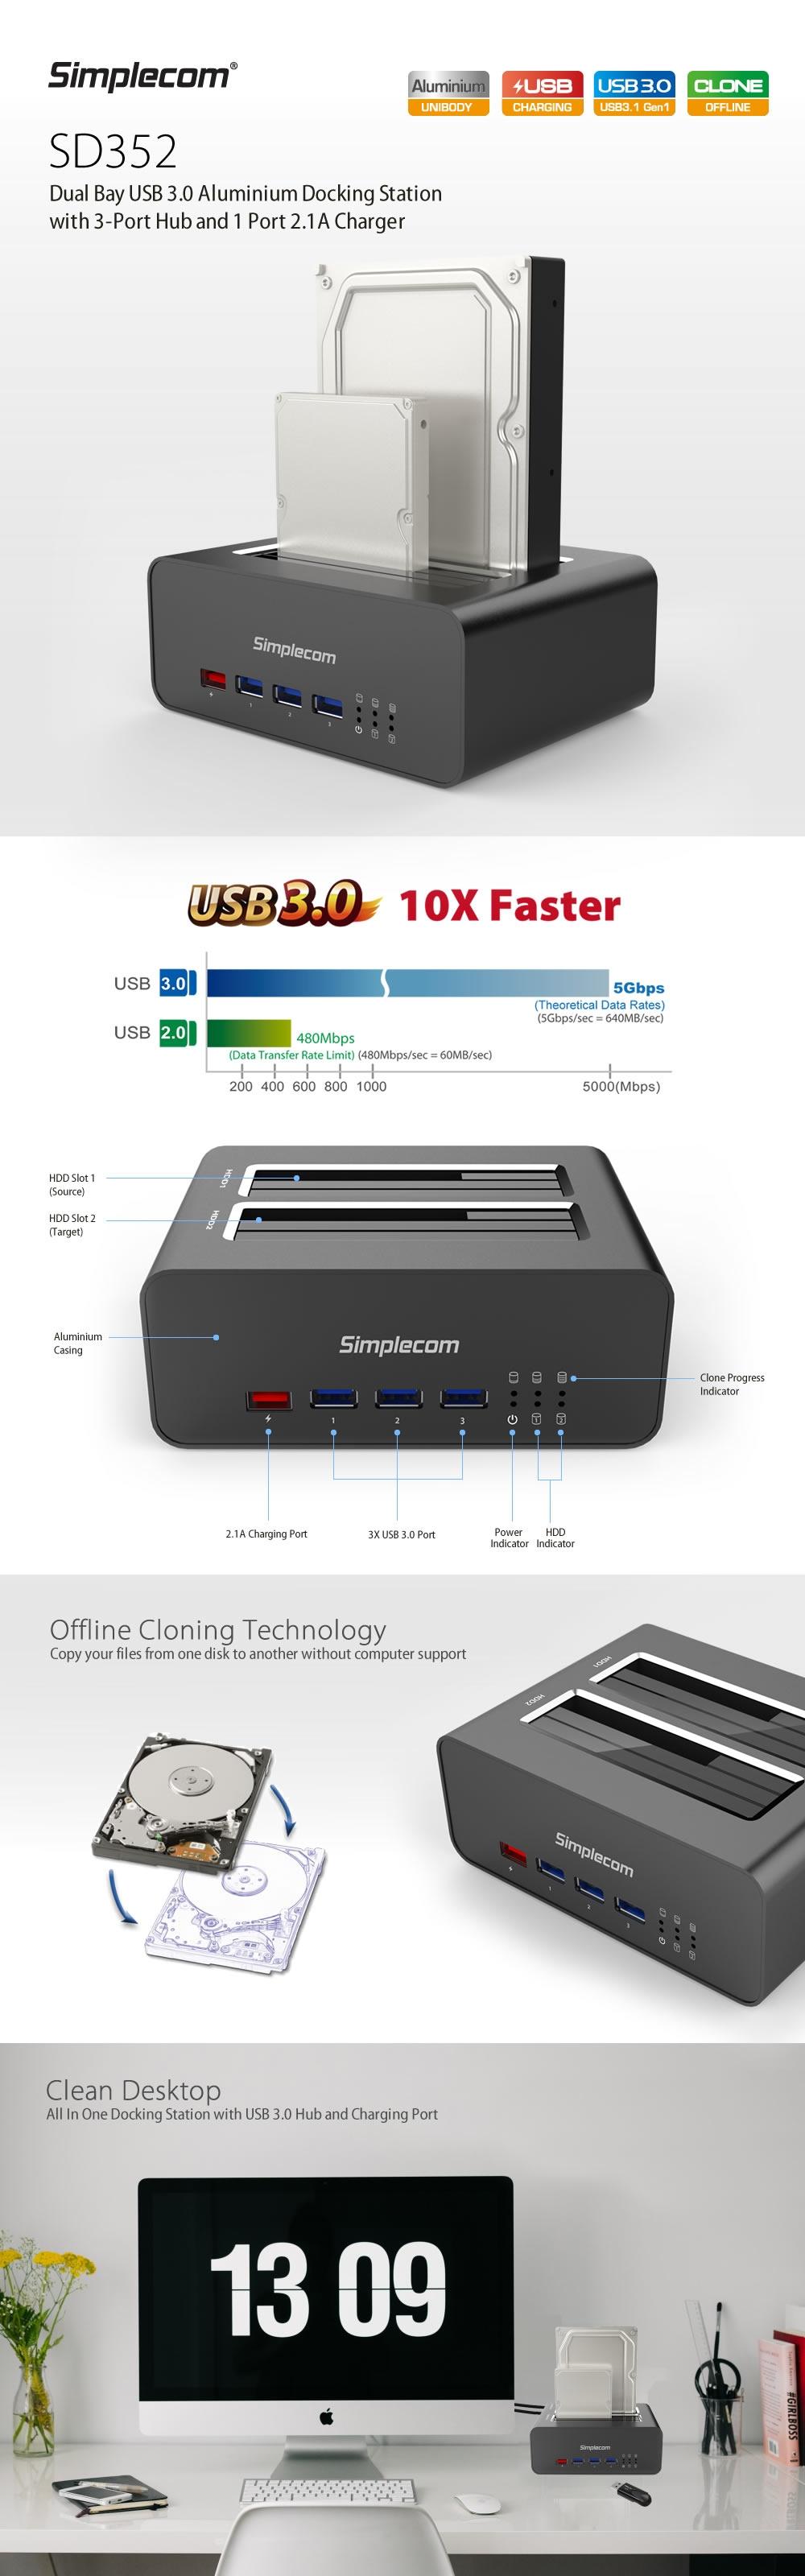 Simplecom SD352 USB 3.0 to Dual SATA HDD Aluminium Docking Station - Desktop Overview 1